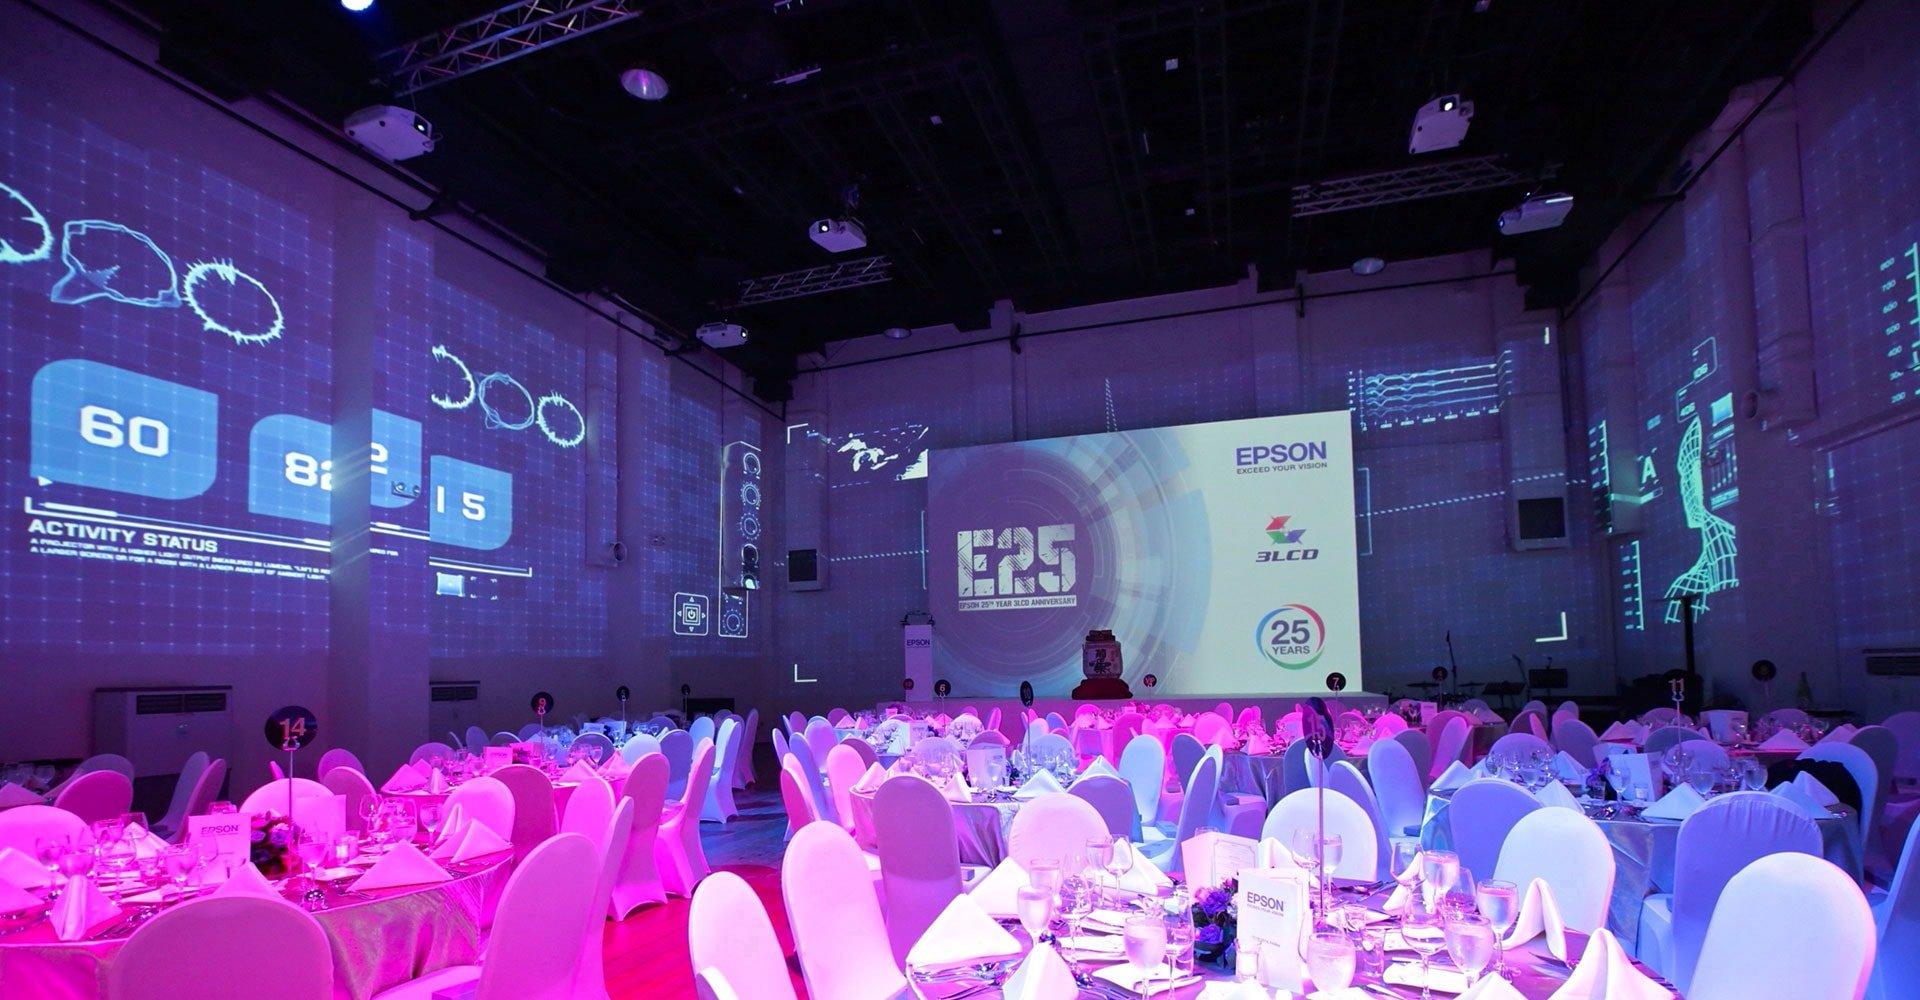 Event Management Company - Live Group